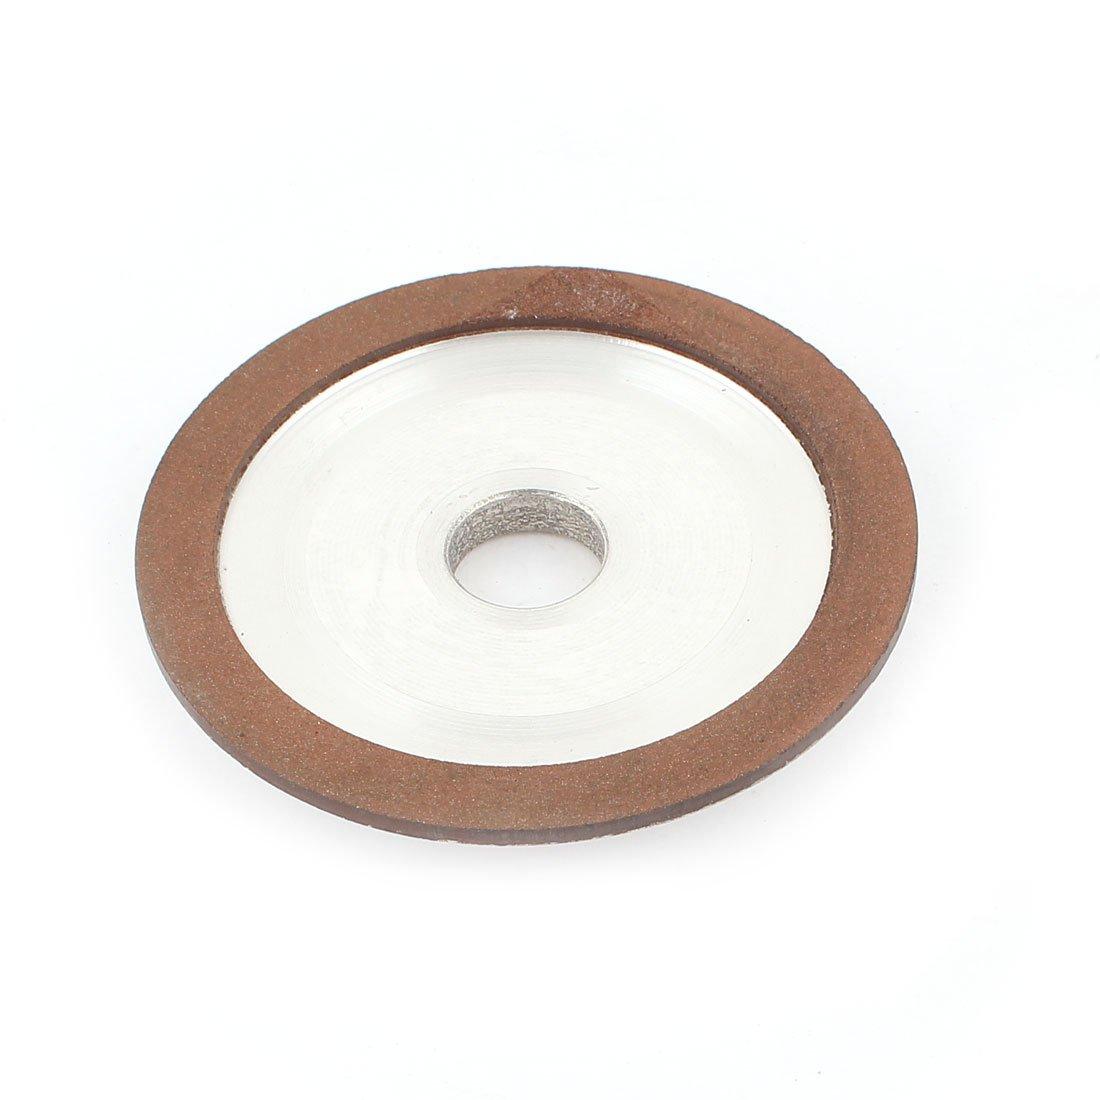 3'' x 3/8'' Resin Bond Plain Round Diamond Grinding Wheel 150 Grit 75%